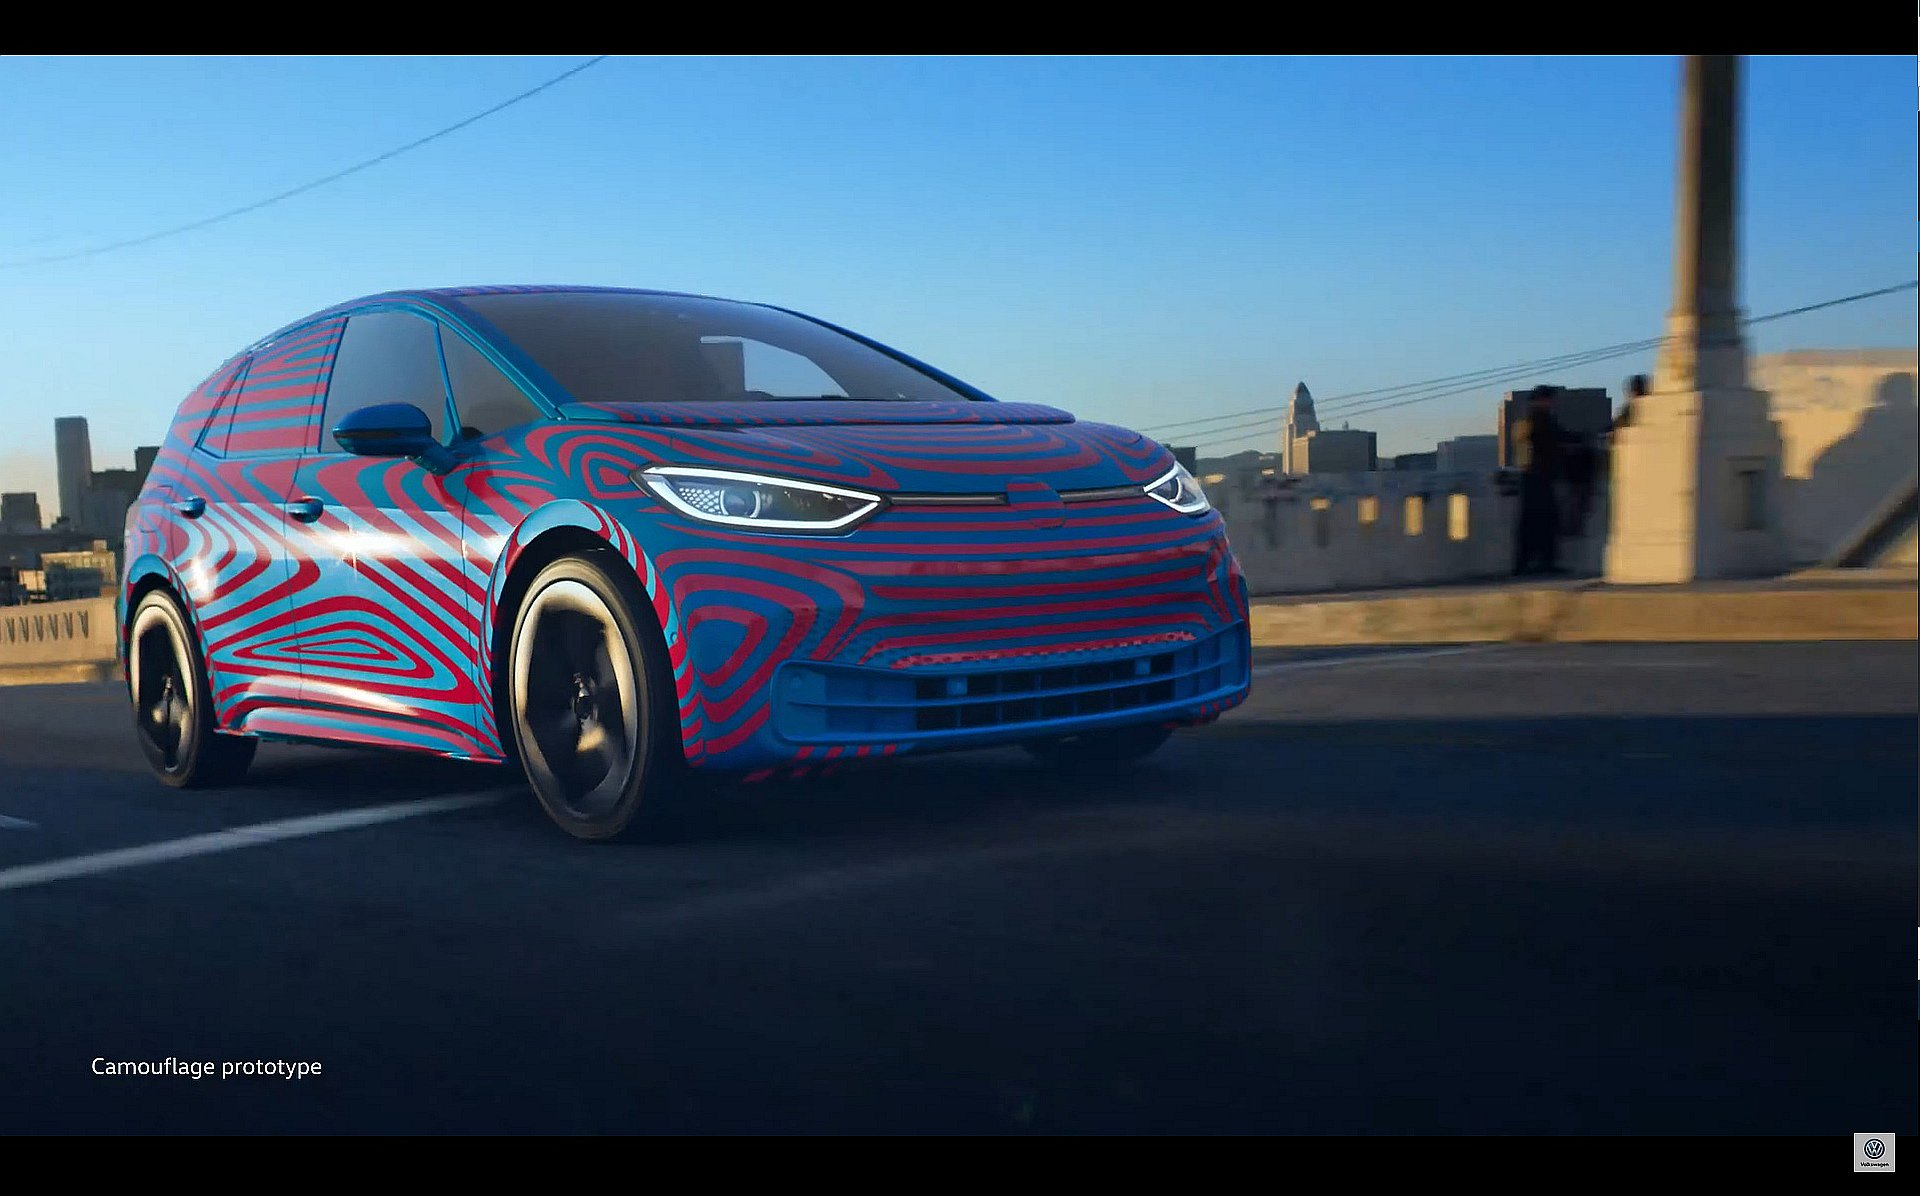 2020 Volkswagen ID.3 Teased With 550-Km Range - autoevolution